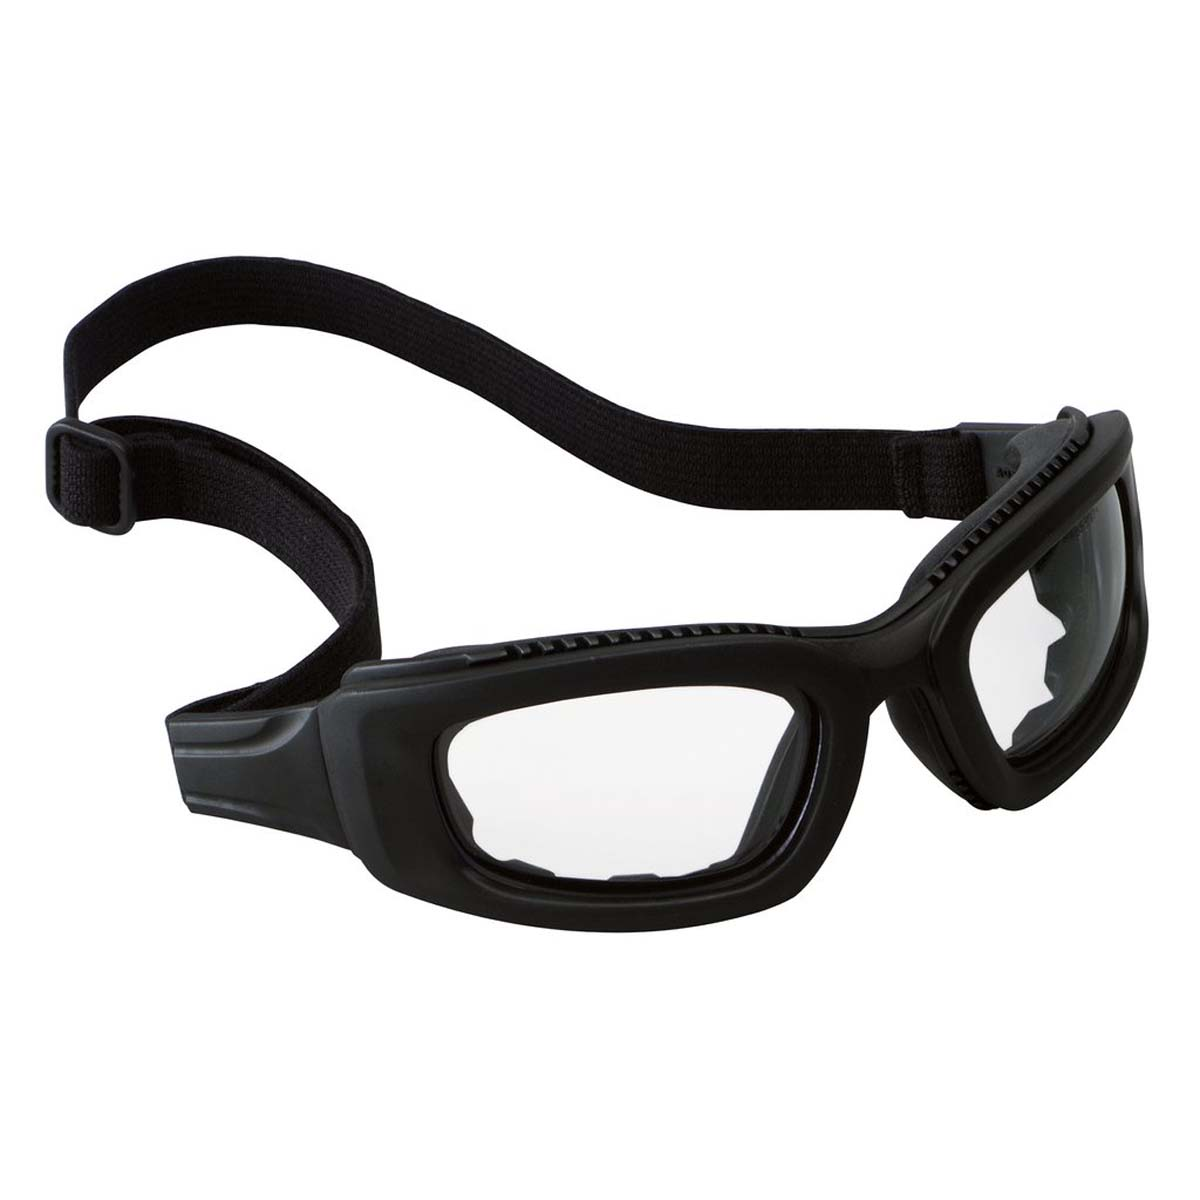 "3Mâ""¢ Maximâ""¢ 2x2 Safety Goggles 40686-00000-10 Clear Anti-Fog Lens, Black Frame, Elastic Strap"